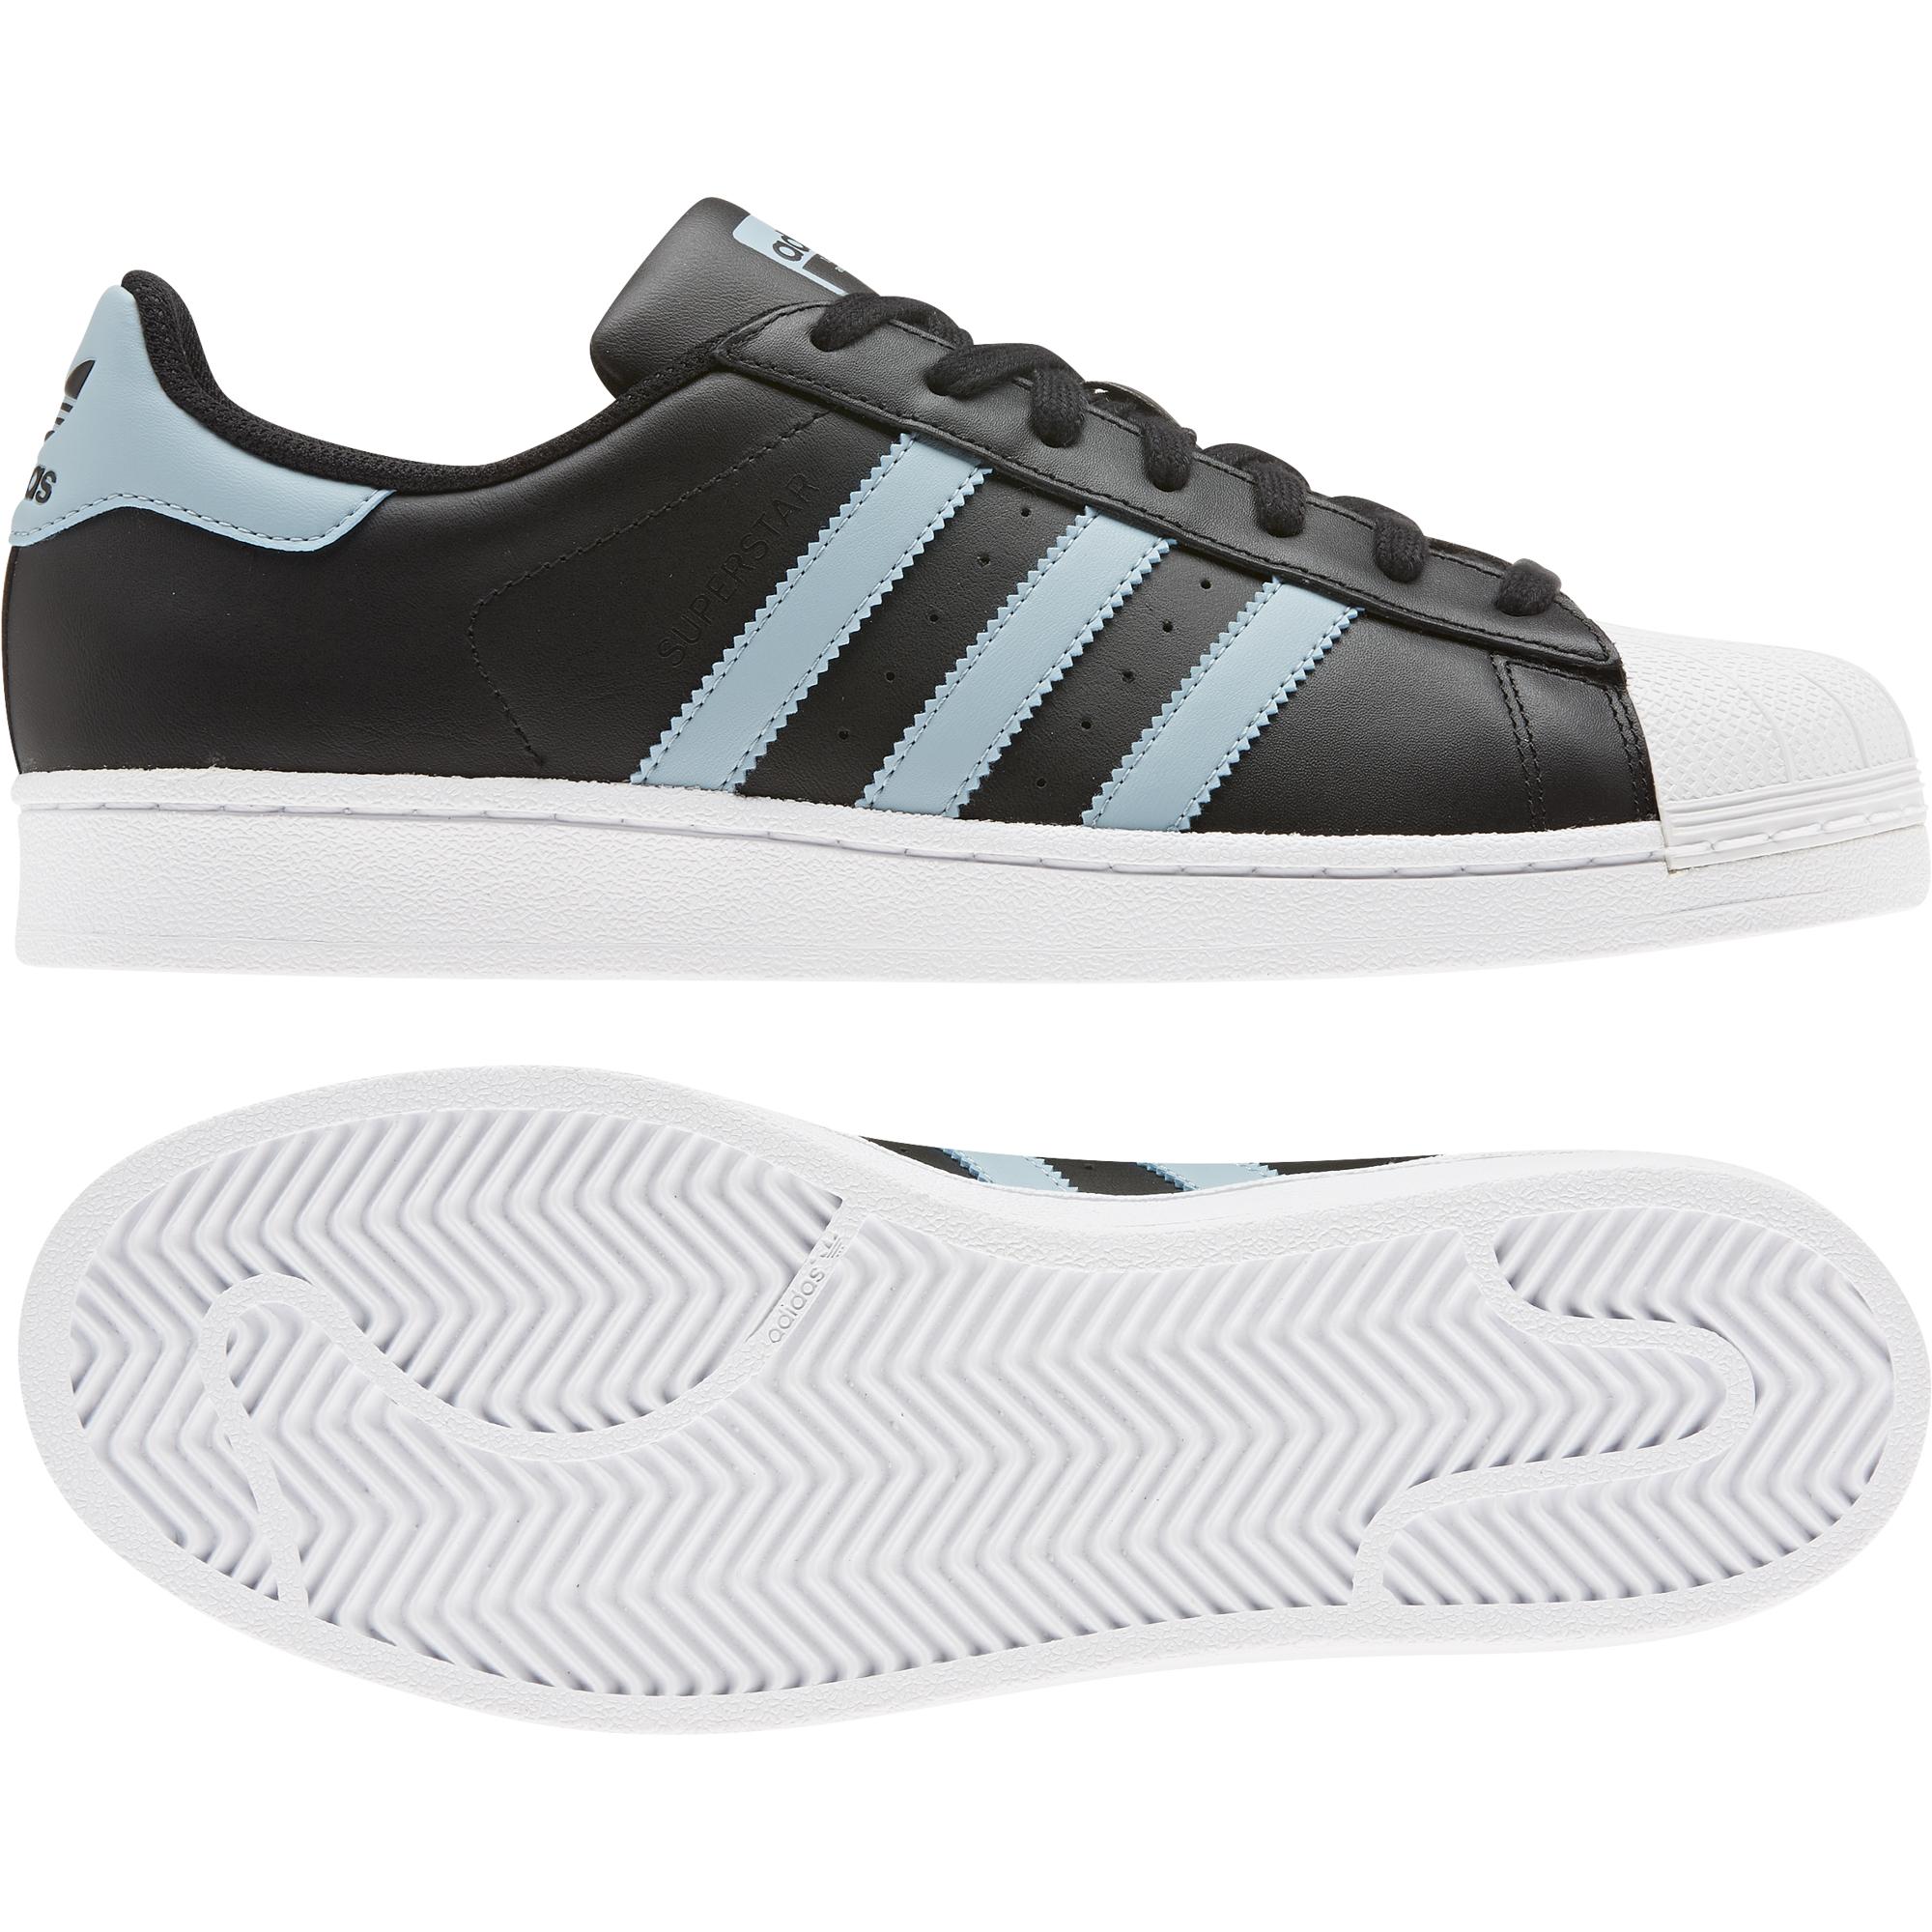 nouveau produit b587b 9b0fb Chaussures adidas Superstar